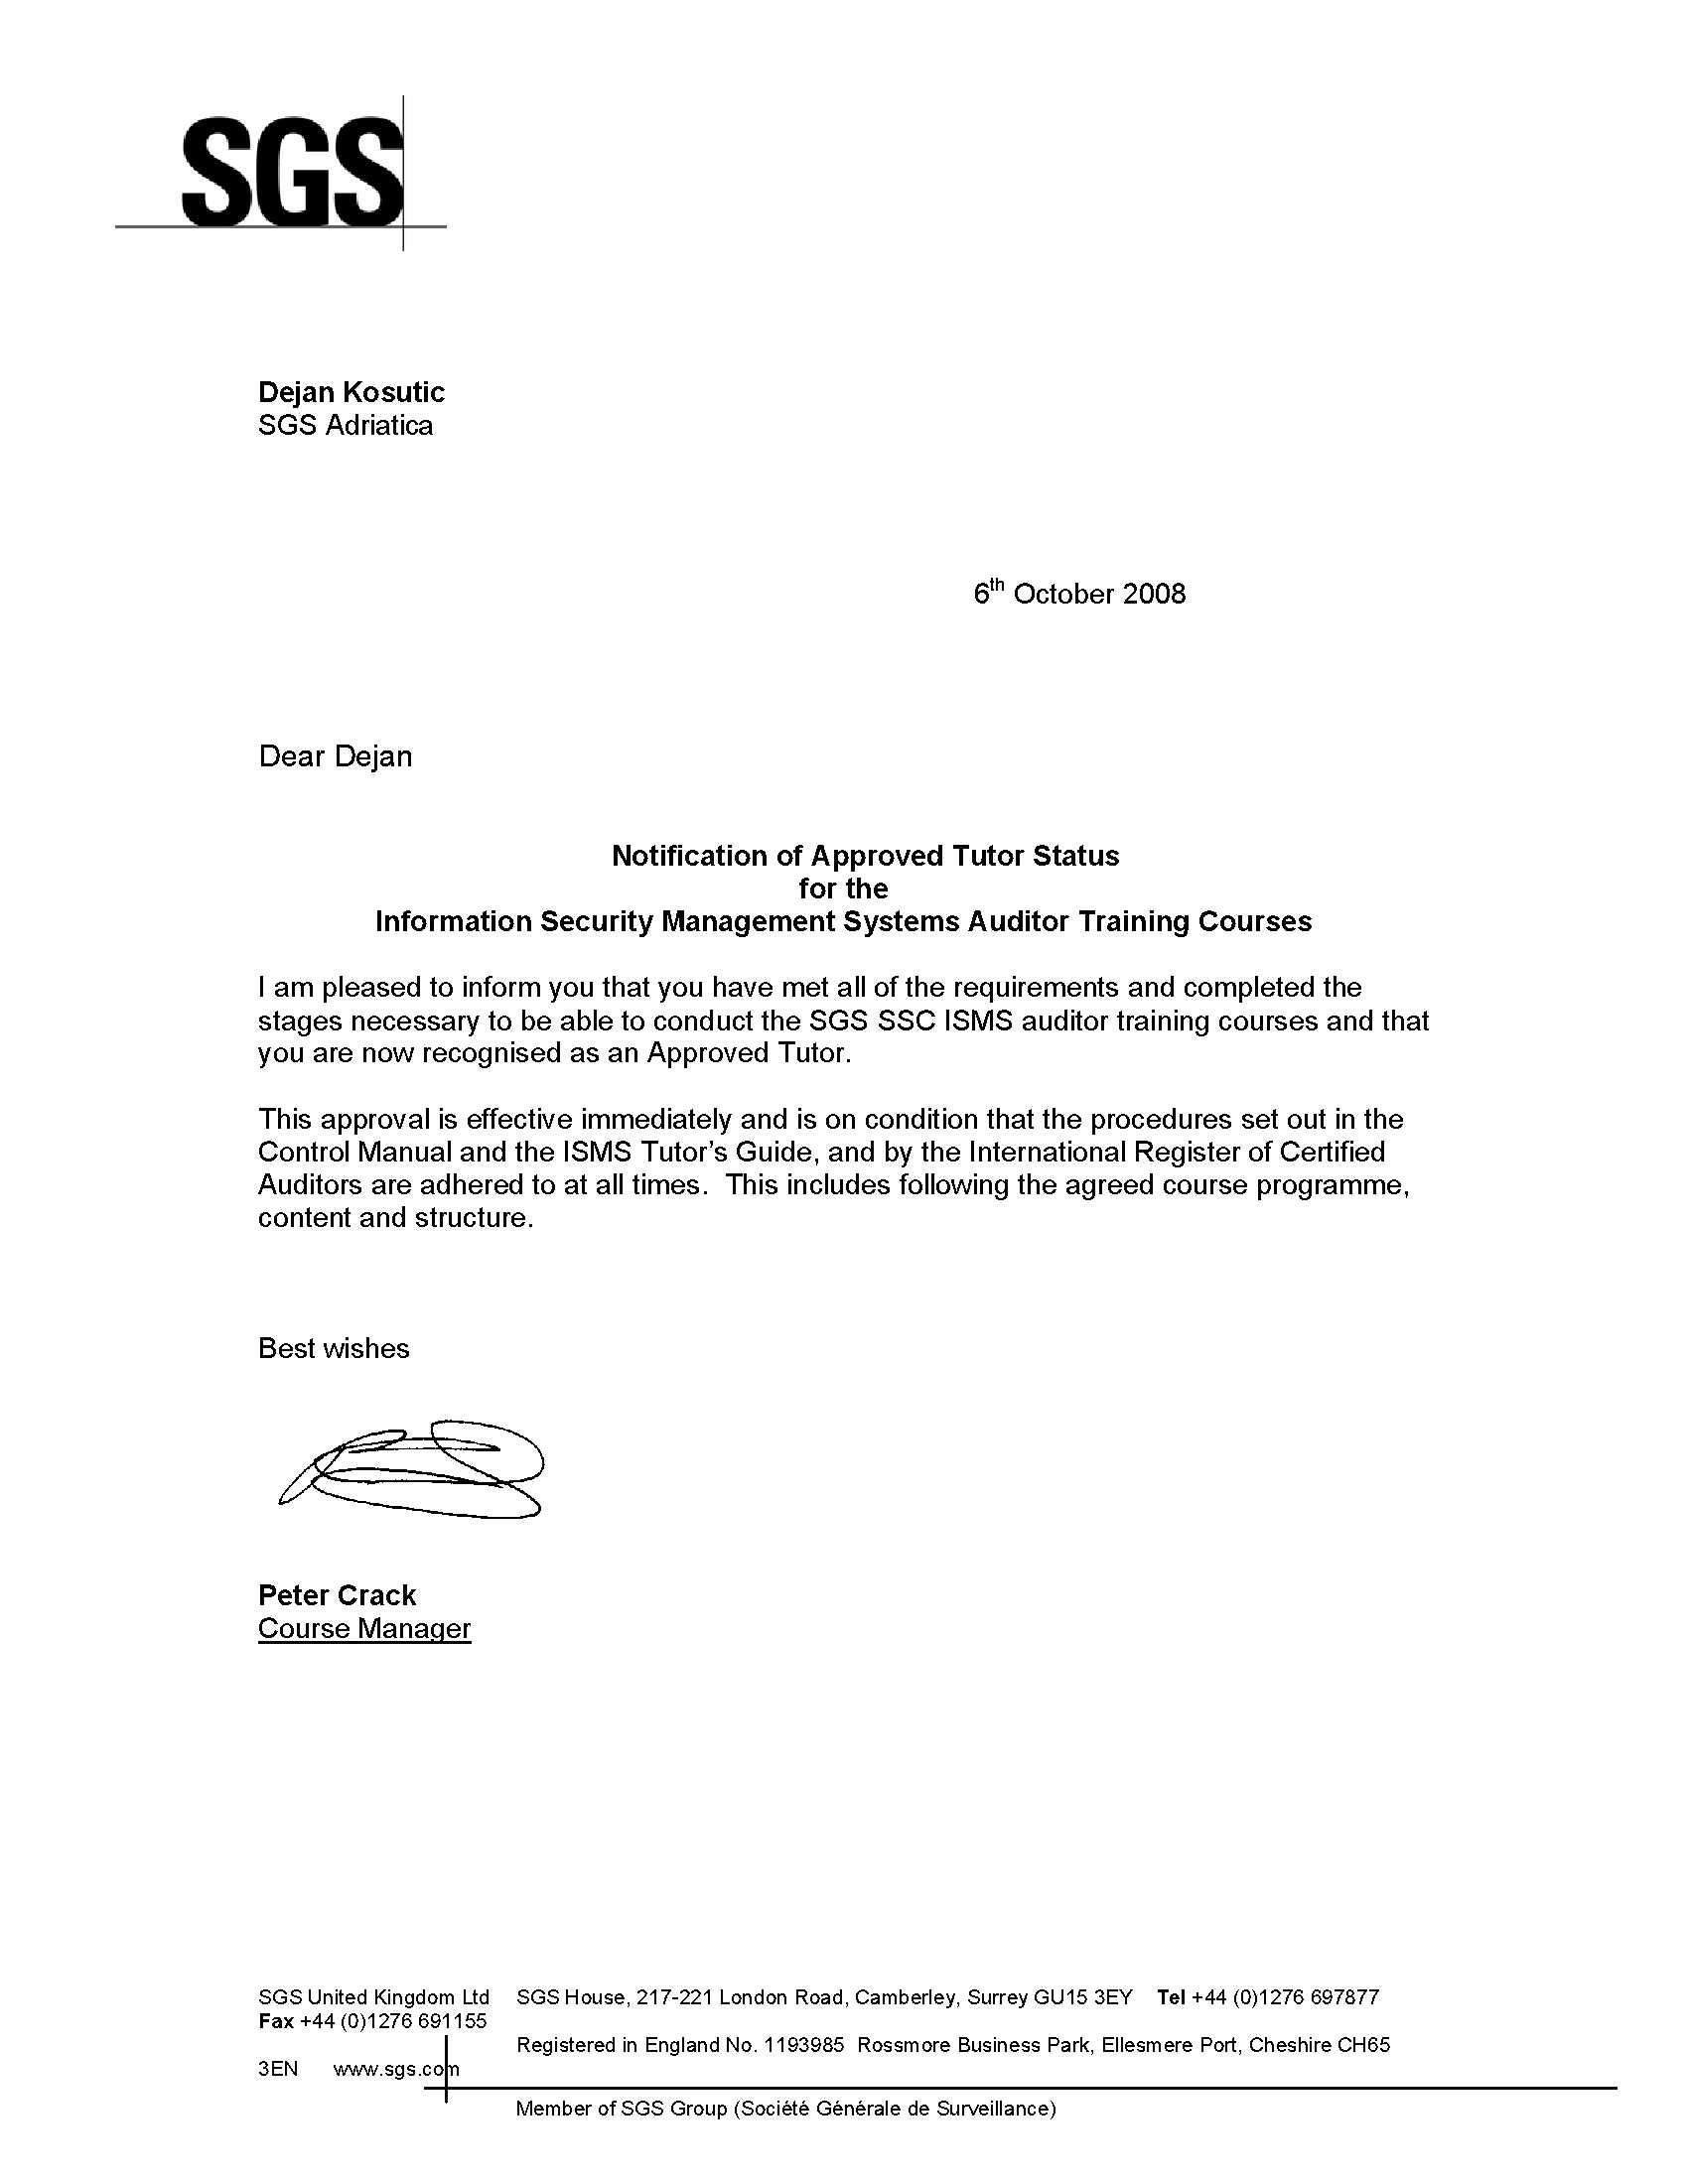 Approved Tutor Status ISMS (SGS).jpg